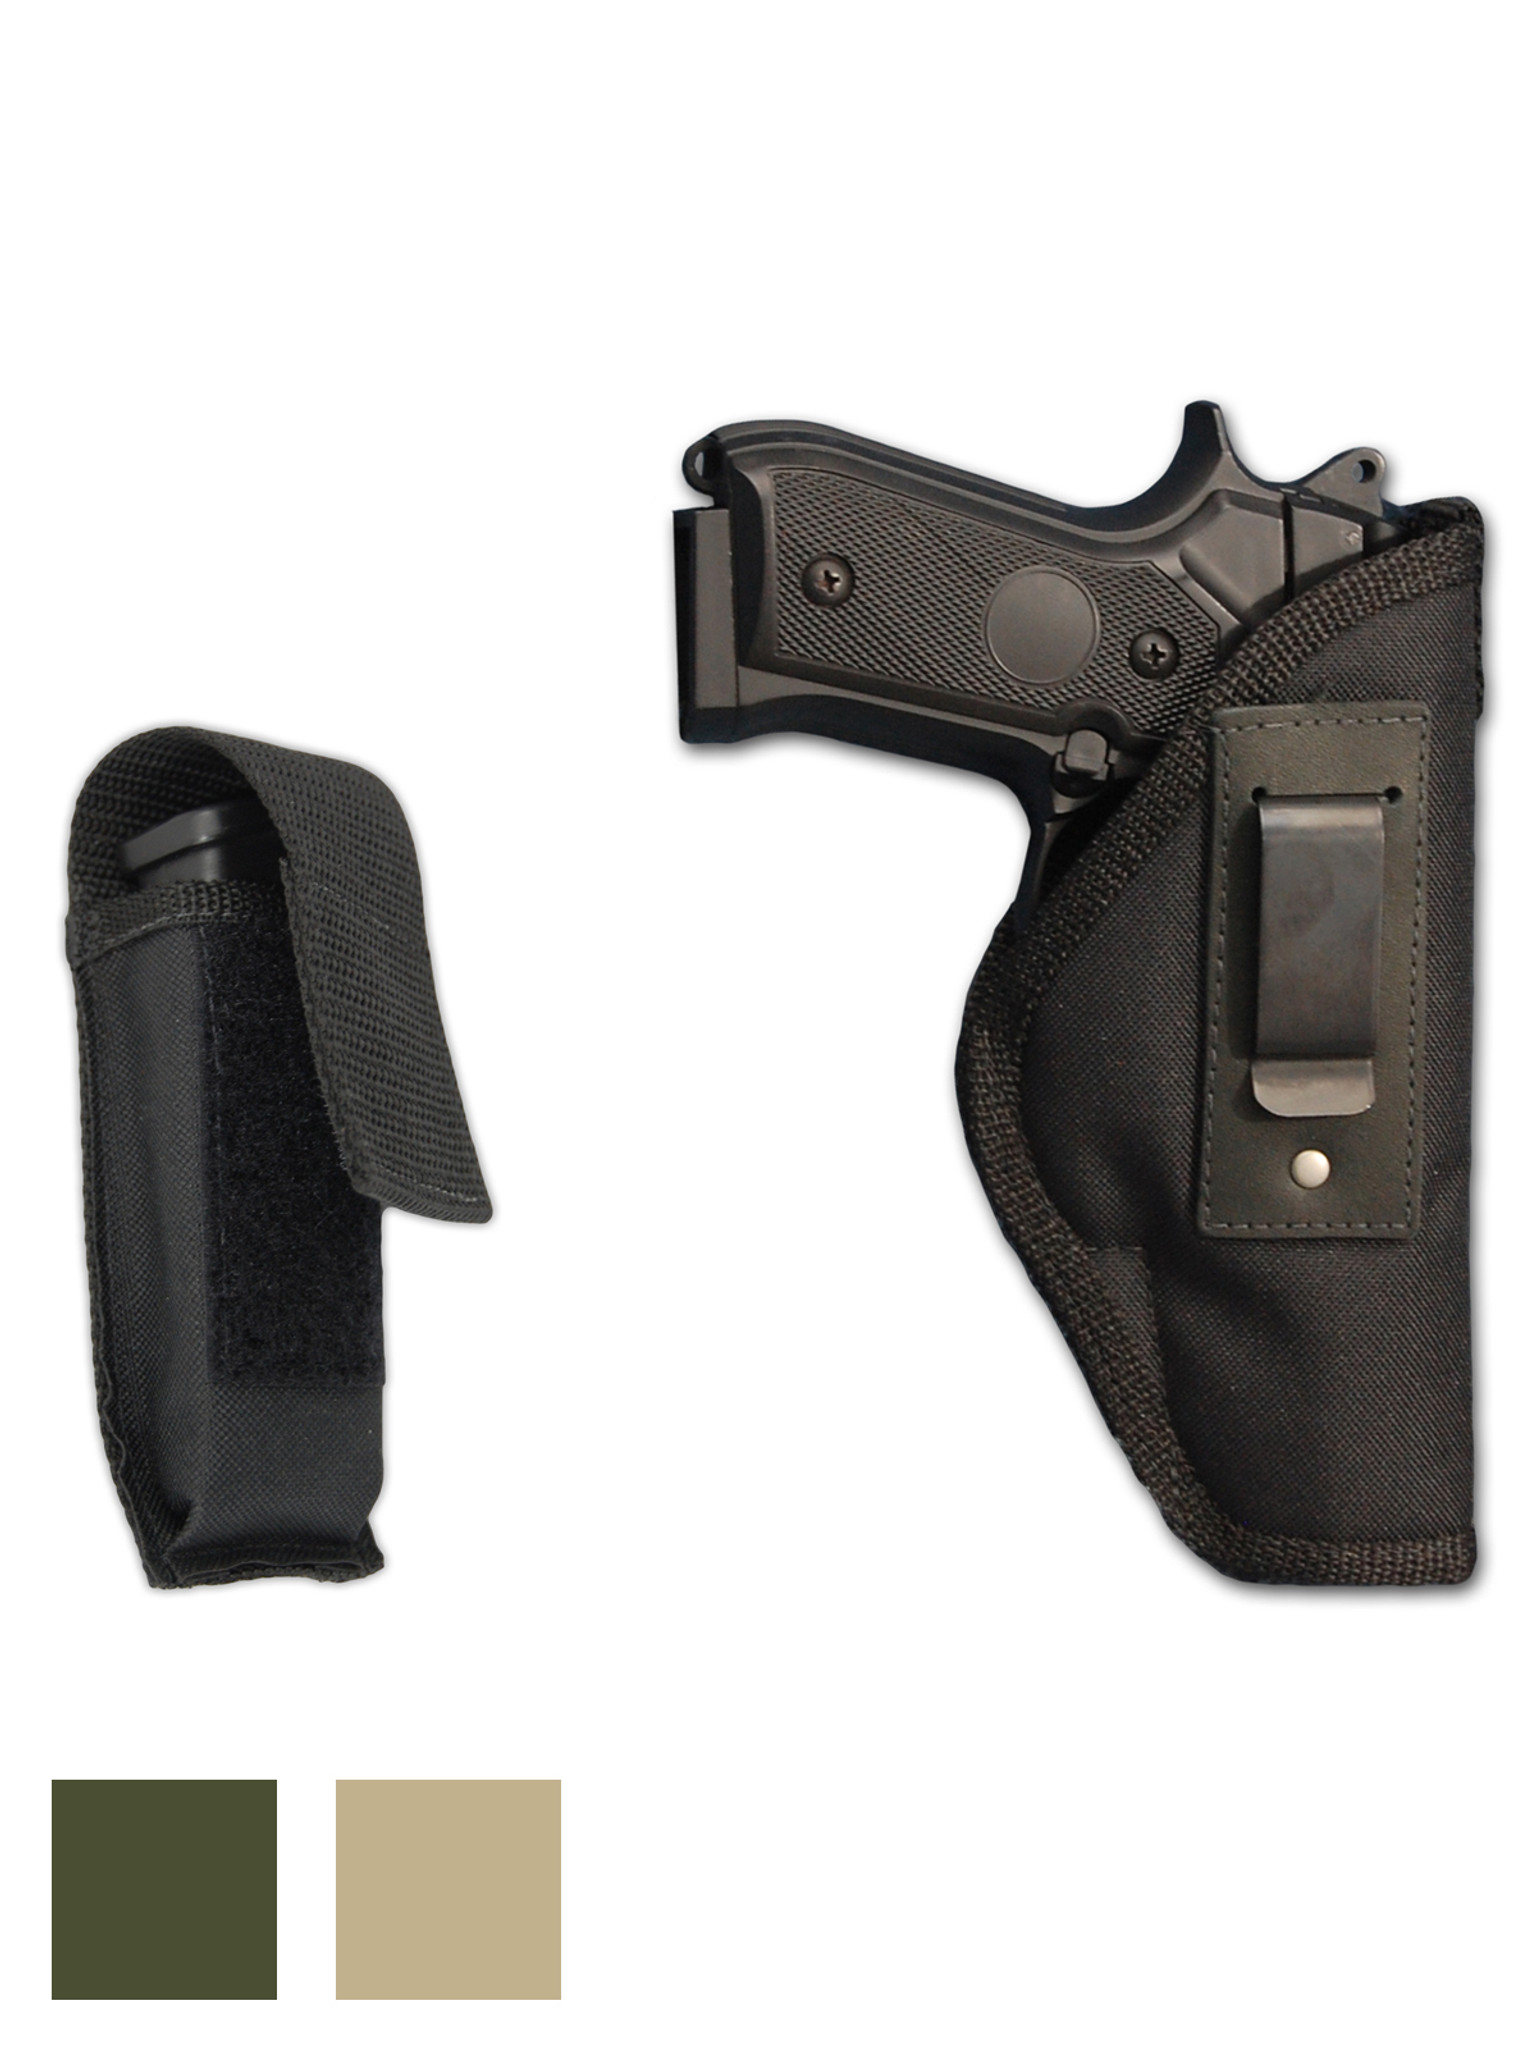 NEW Barsony Black Leather Single Magazine Pouch Astra Beretta Full Size 9mm 40